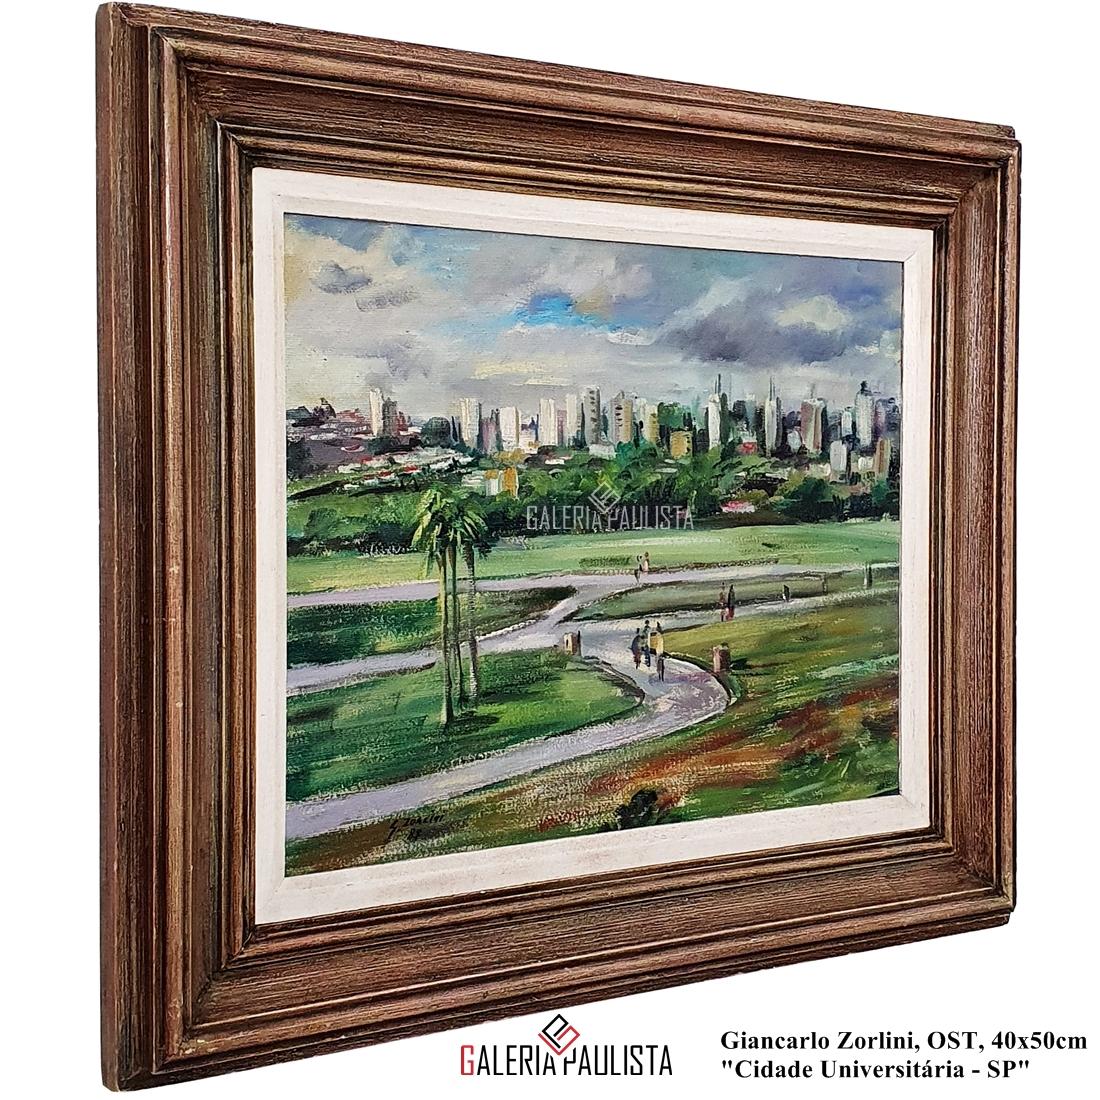 GP-P21224-Giancarlo-Zorlini-Cidade-Universitaria-OST-50×40-Galeria-Paulista-2